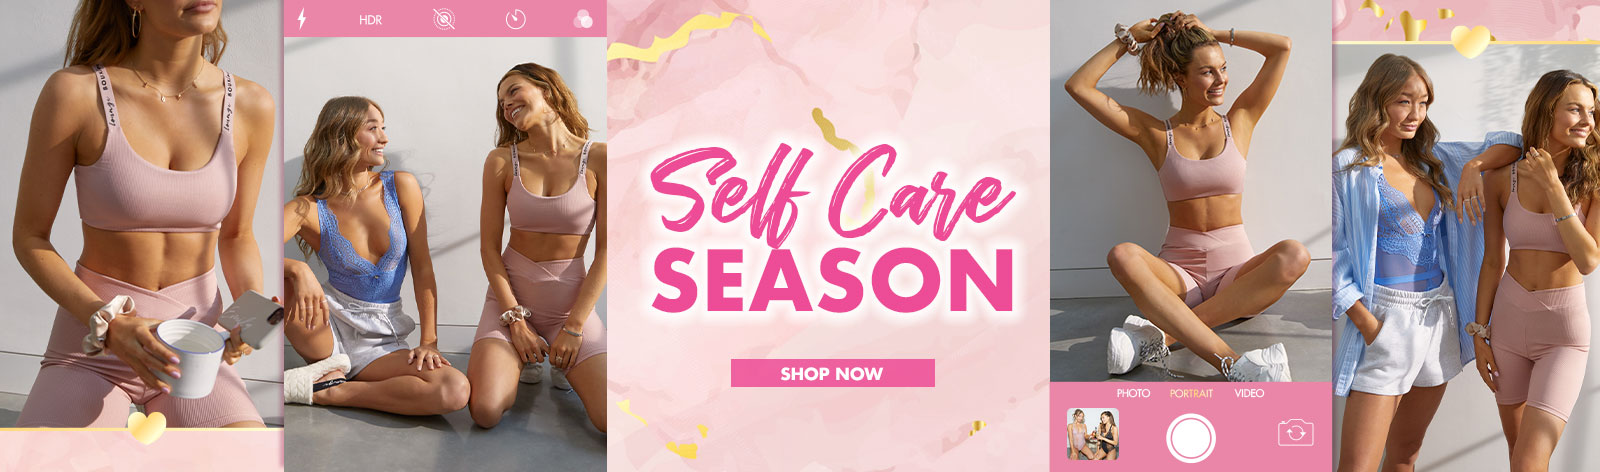 Self care season